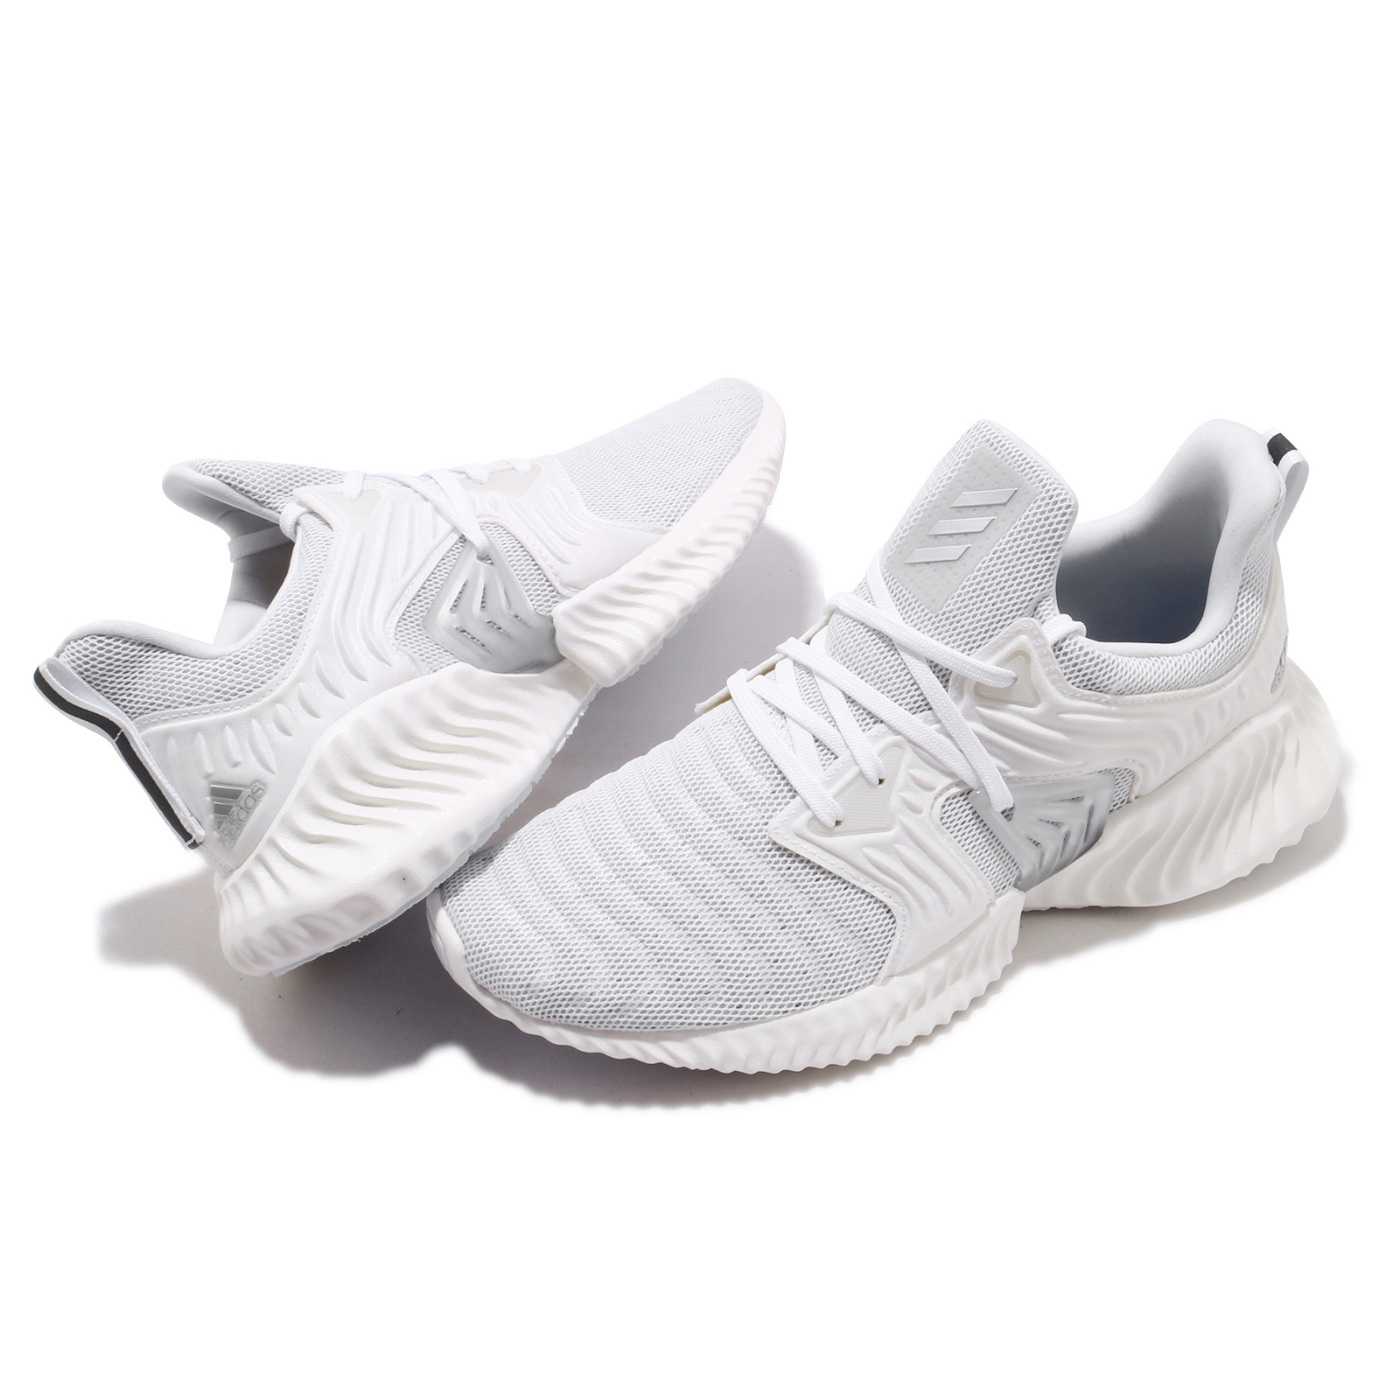 adidas 慢跑鞋 Alphabounce 運動休閒 男鞋 海外限定 愛迪達 緩震 路跑 球鞋穿搭 白 灰 EF1240